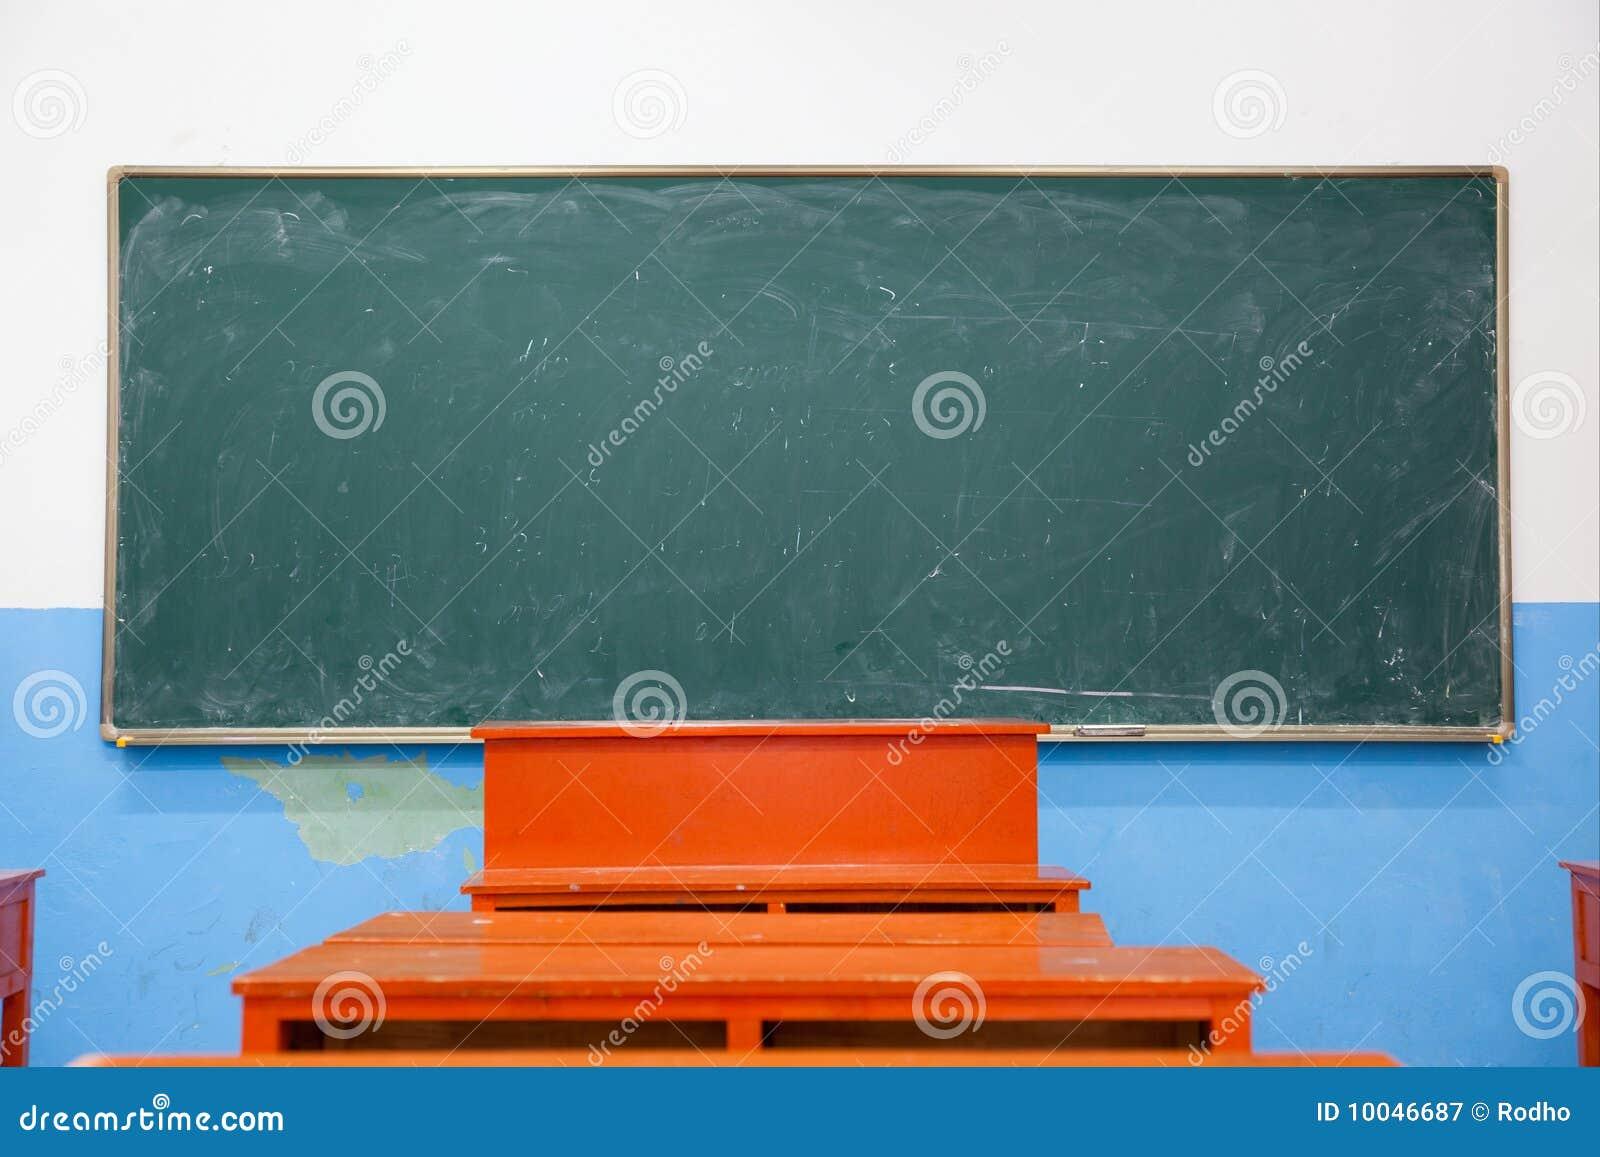 Classroom Blackboard Design ~ Blackboard in classroom royalty free stock photography